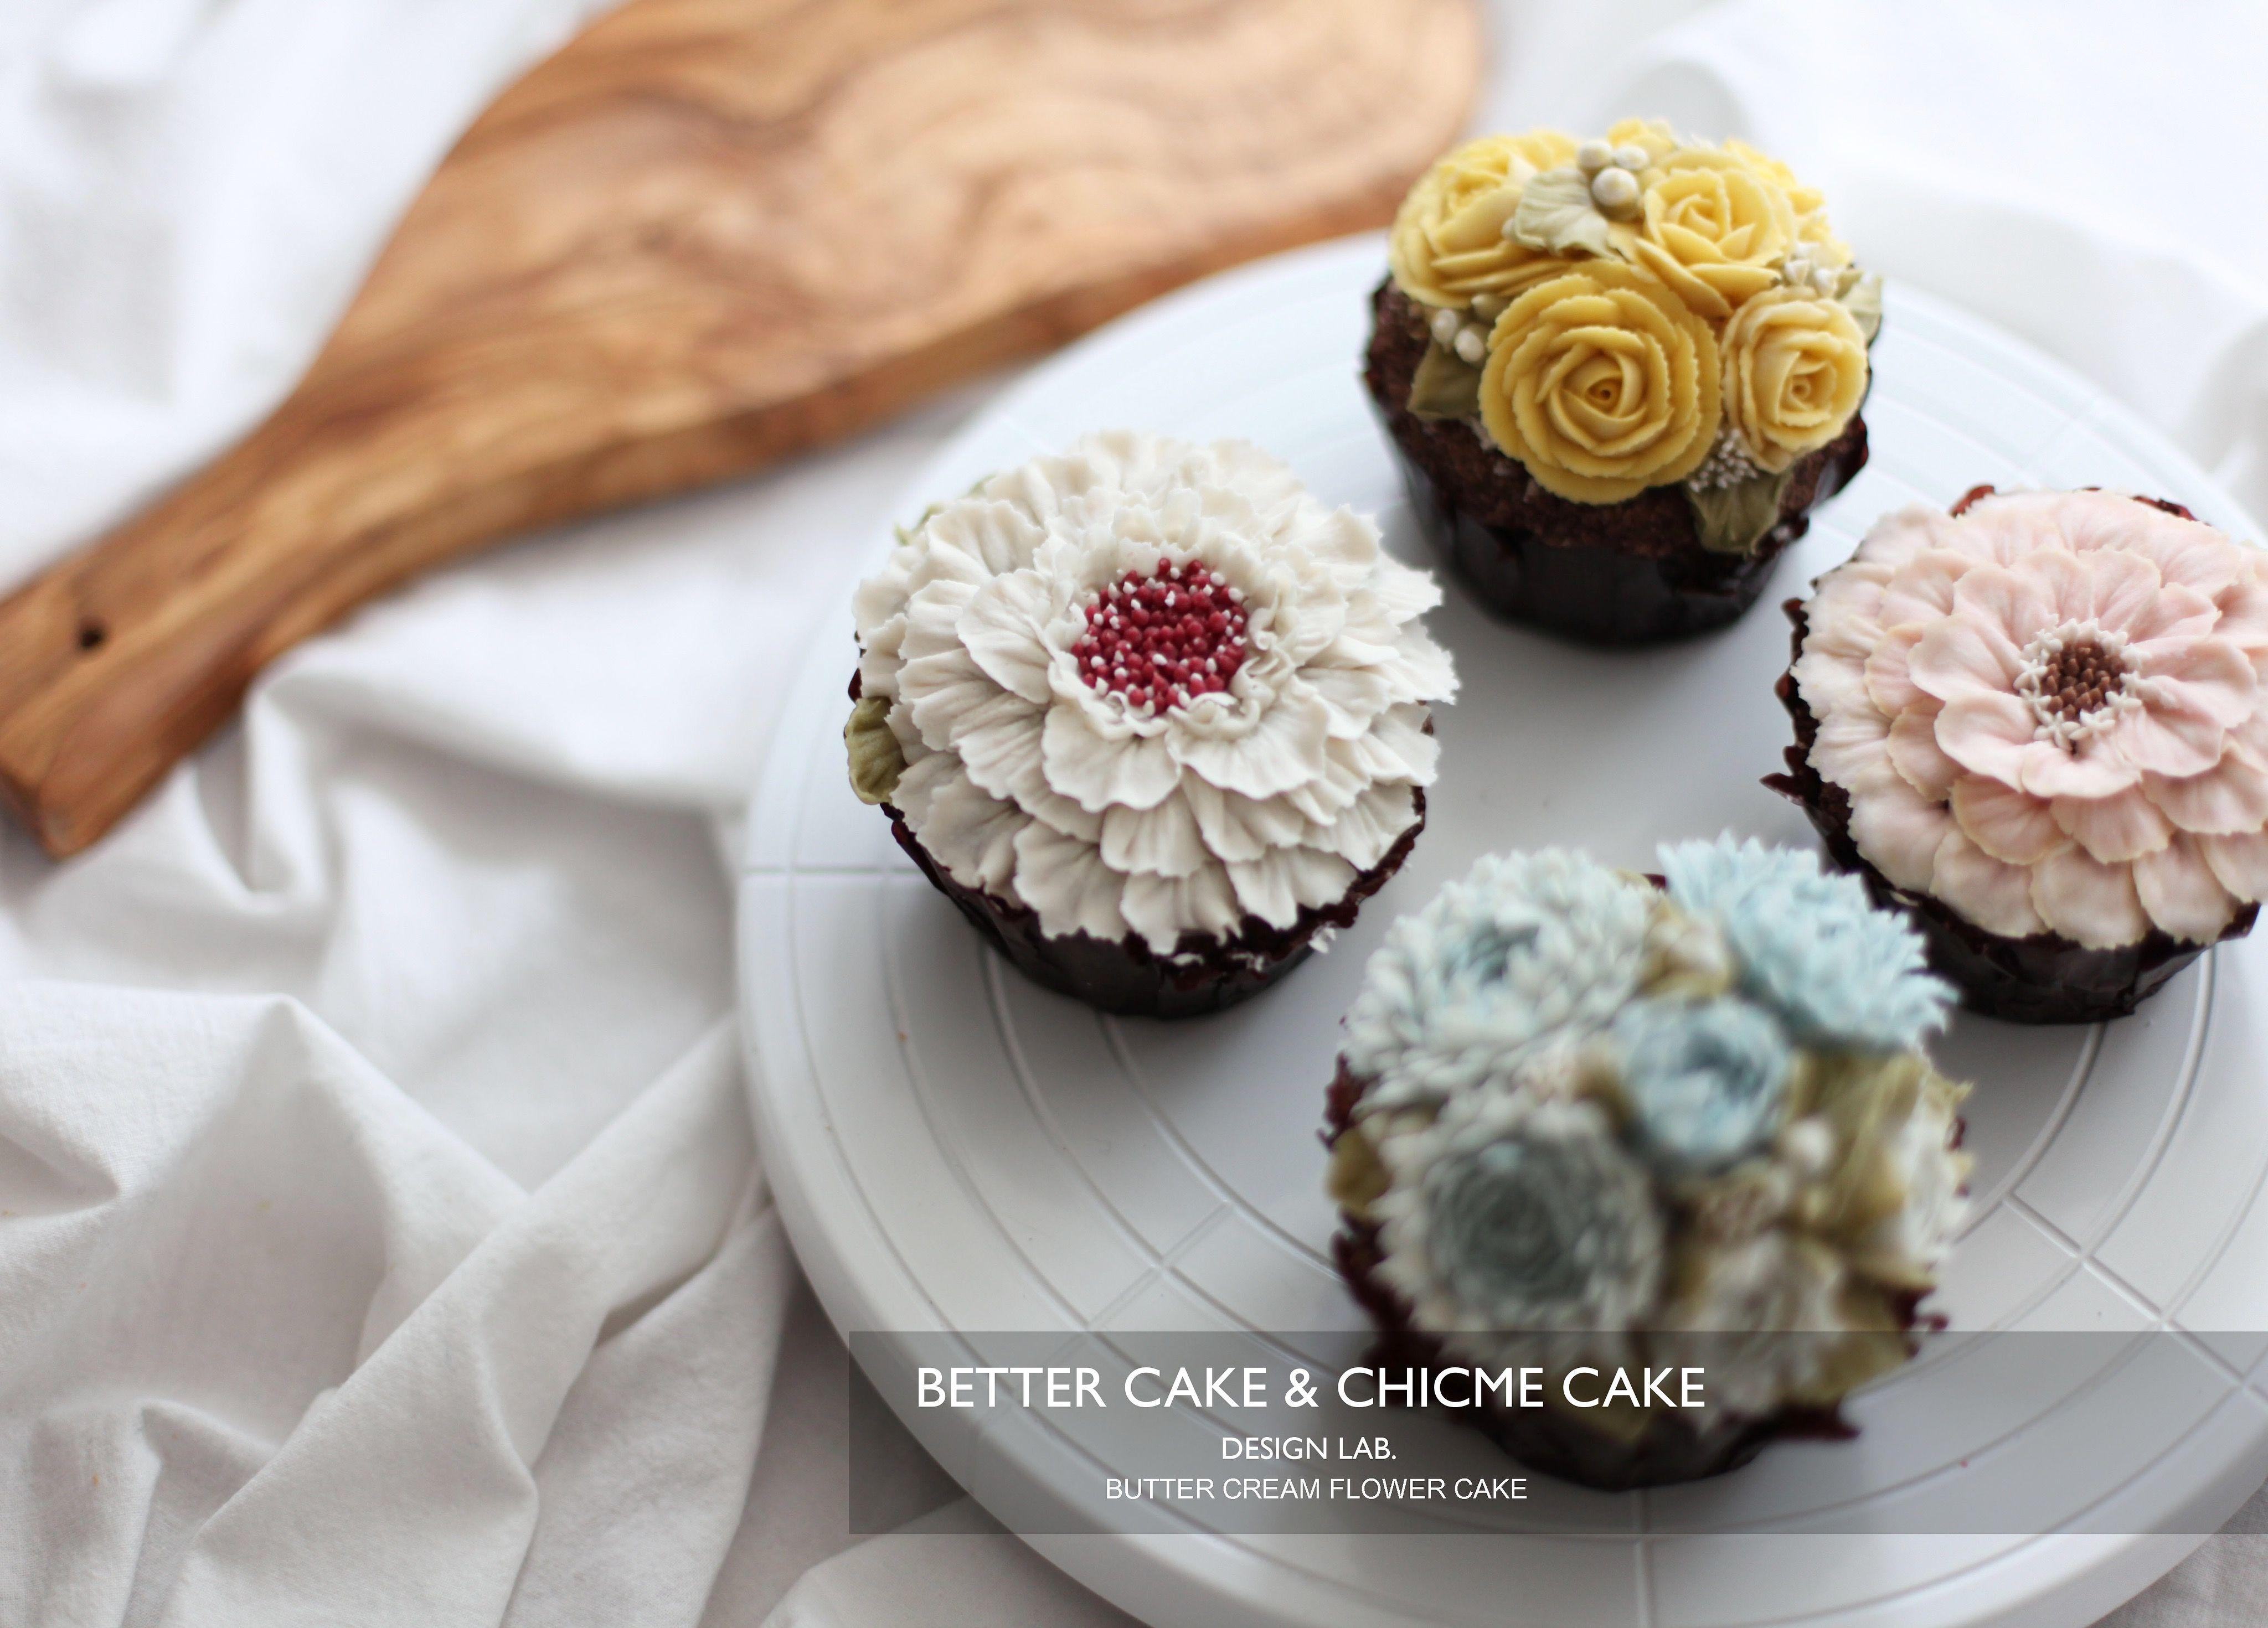 Student's work Beanpaste rice cup cakes   Any further inquiries about our class,  Mailbettercakes@naver.com Linebetter_cake FacebookBetter Cake Kakaotalkbettercake www.better-cakes.com .  #buttercream#cake#beanpaste #베러케이크#cupcake#flower#꽃#ricecake#앙금플라워#koreabuttercream#wilton#앙금플라워케익#디저트#buttercreamcake#dessert#버터크림플라워케익#follow#떡케익#koreancake#beautiful#윌튼#instacake#beanpasteflower #앙금플라워떡케익#instafood#flowercake